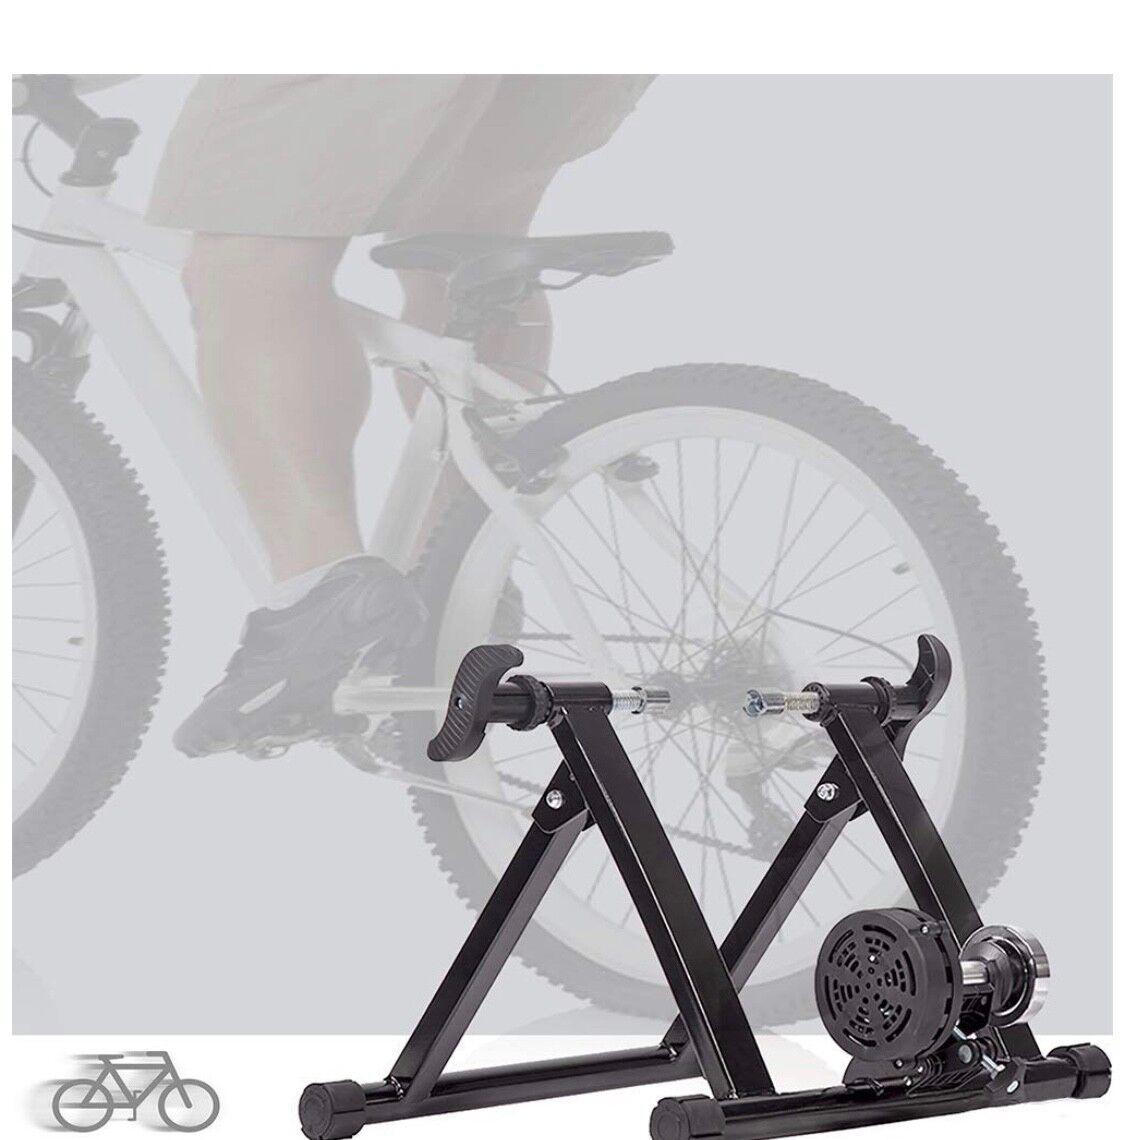 Magnet Steel Bike Bicycle Indoor Exercise Trainer Stand